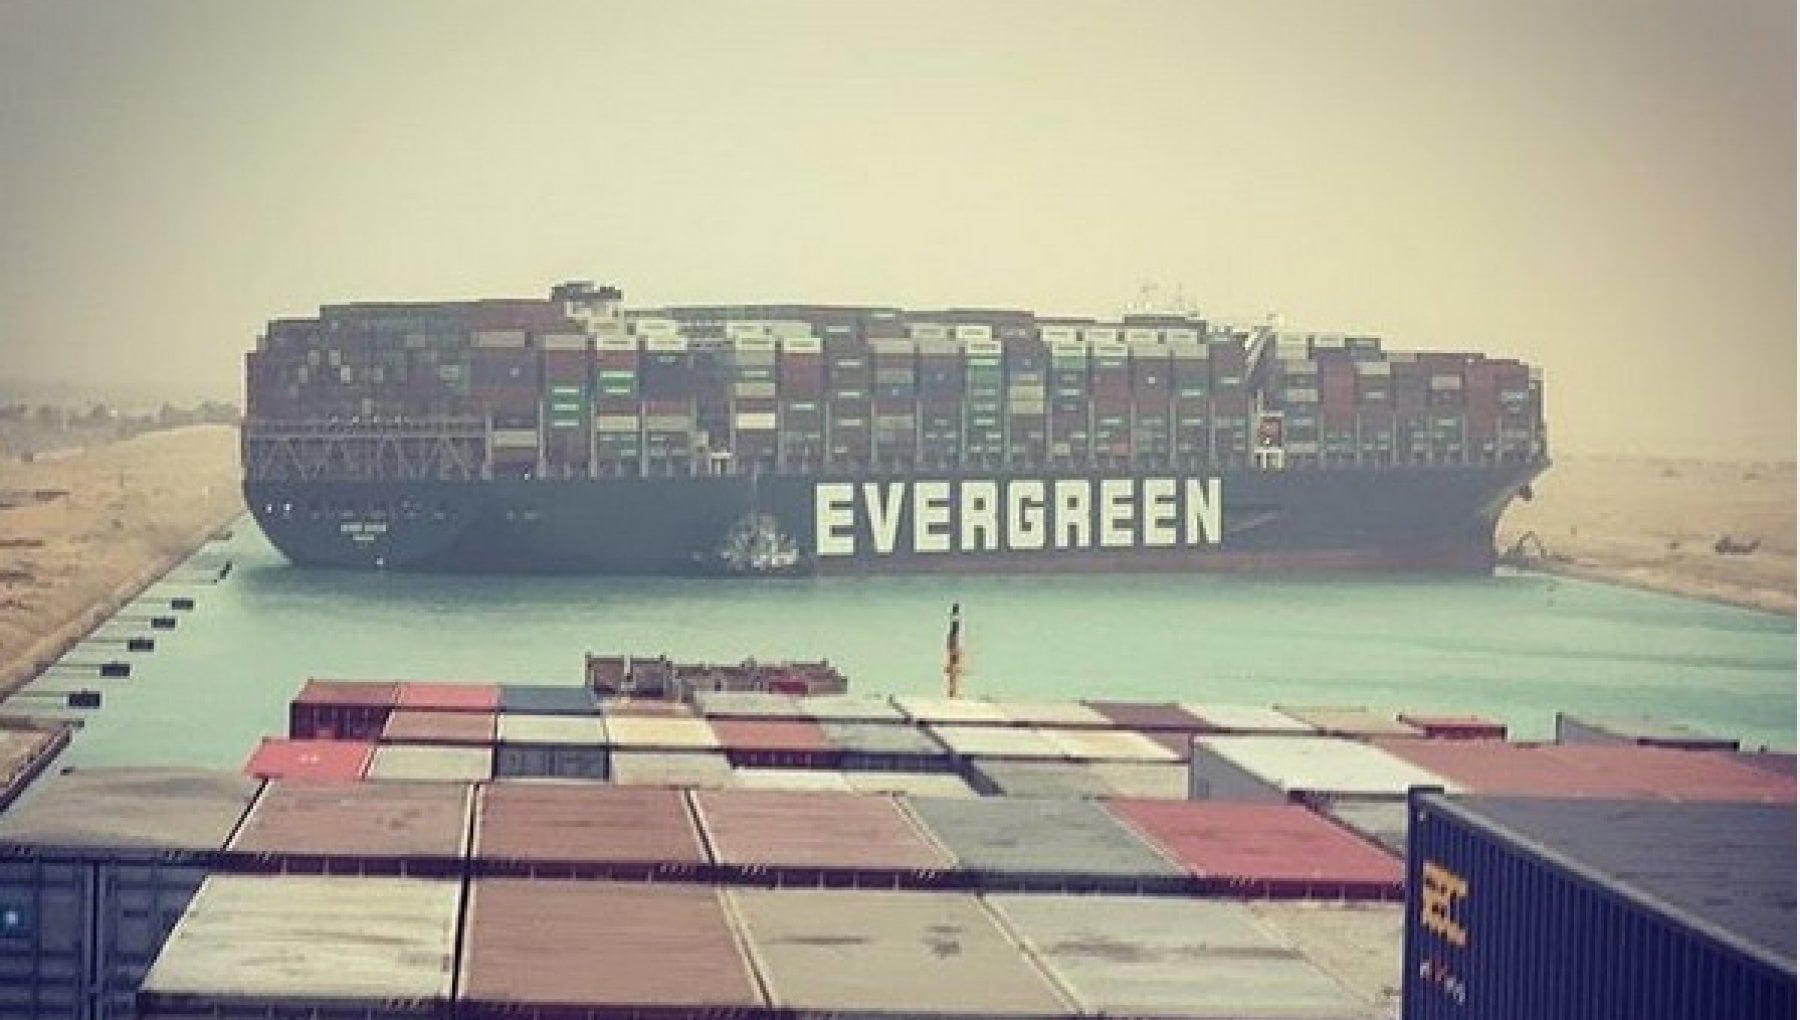 071200522 1152d240 858f 4f43 bb54 7c93f5070b8c - Canale di Suez bloccato da una gigantesca nave portacontainer finita di traverso